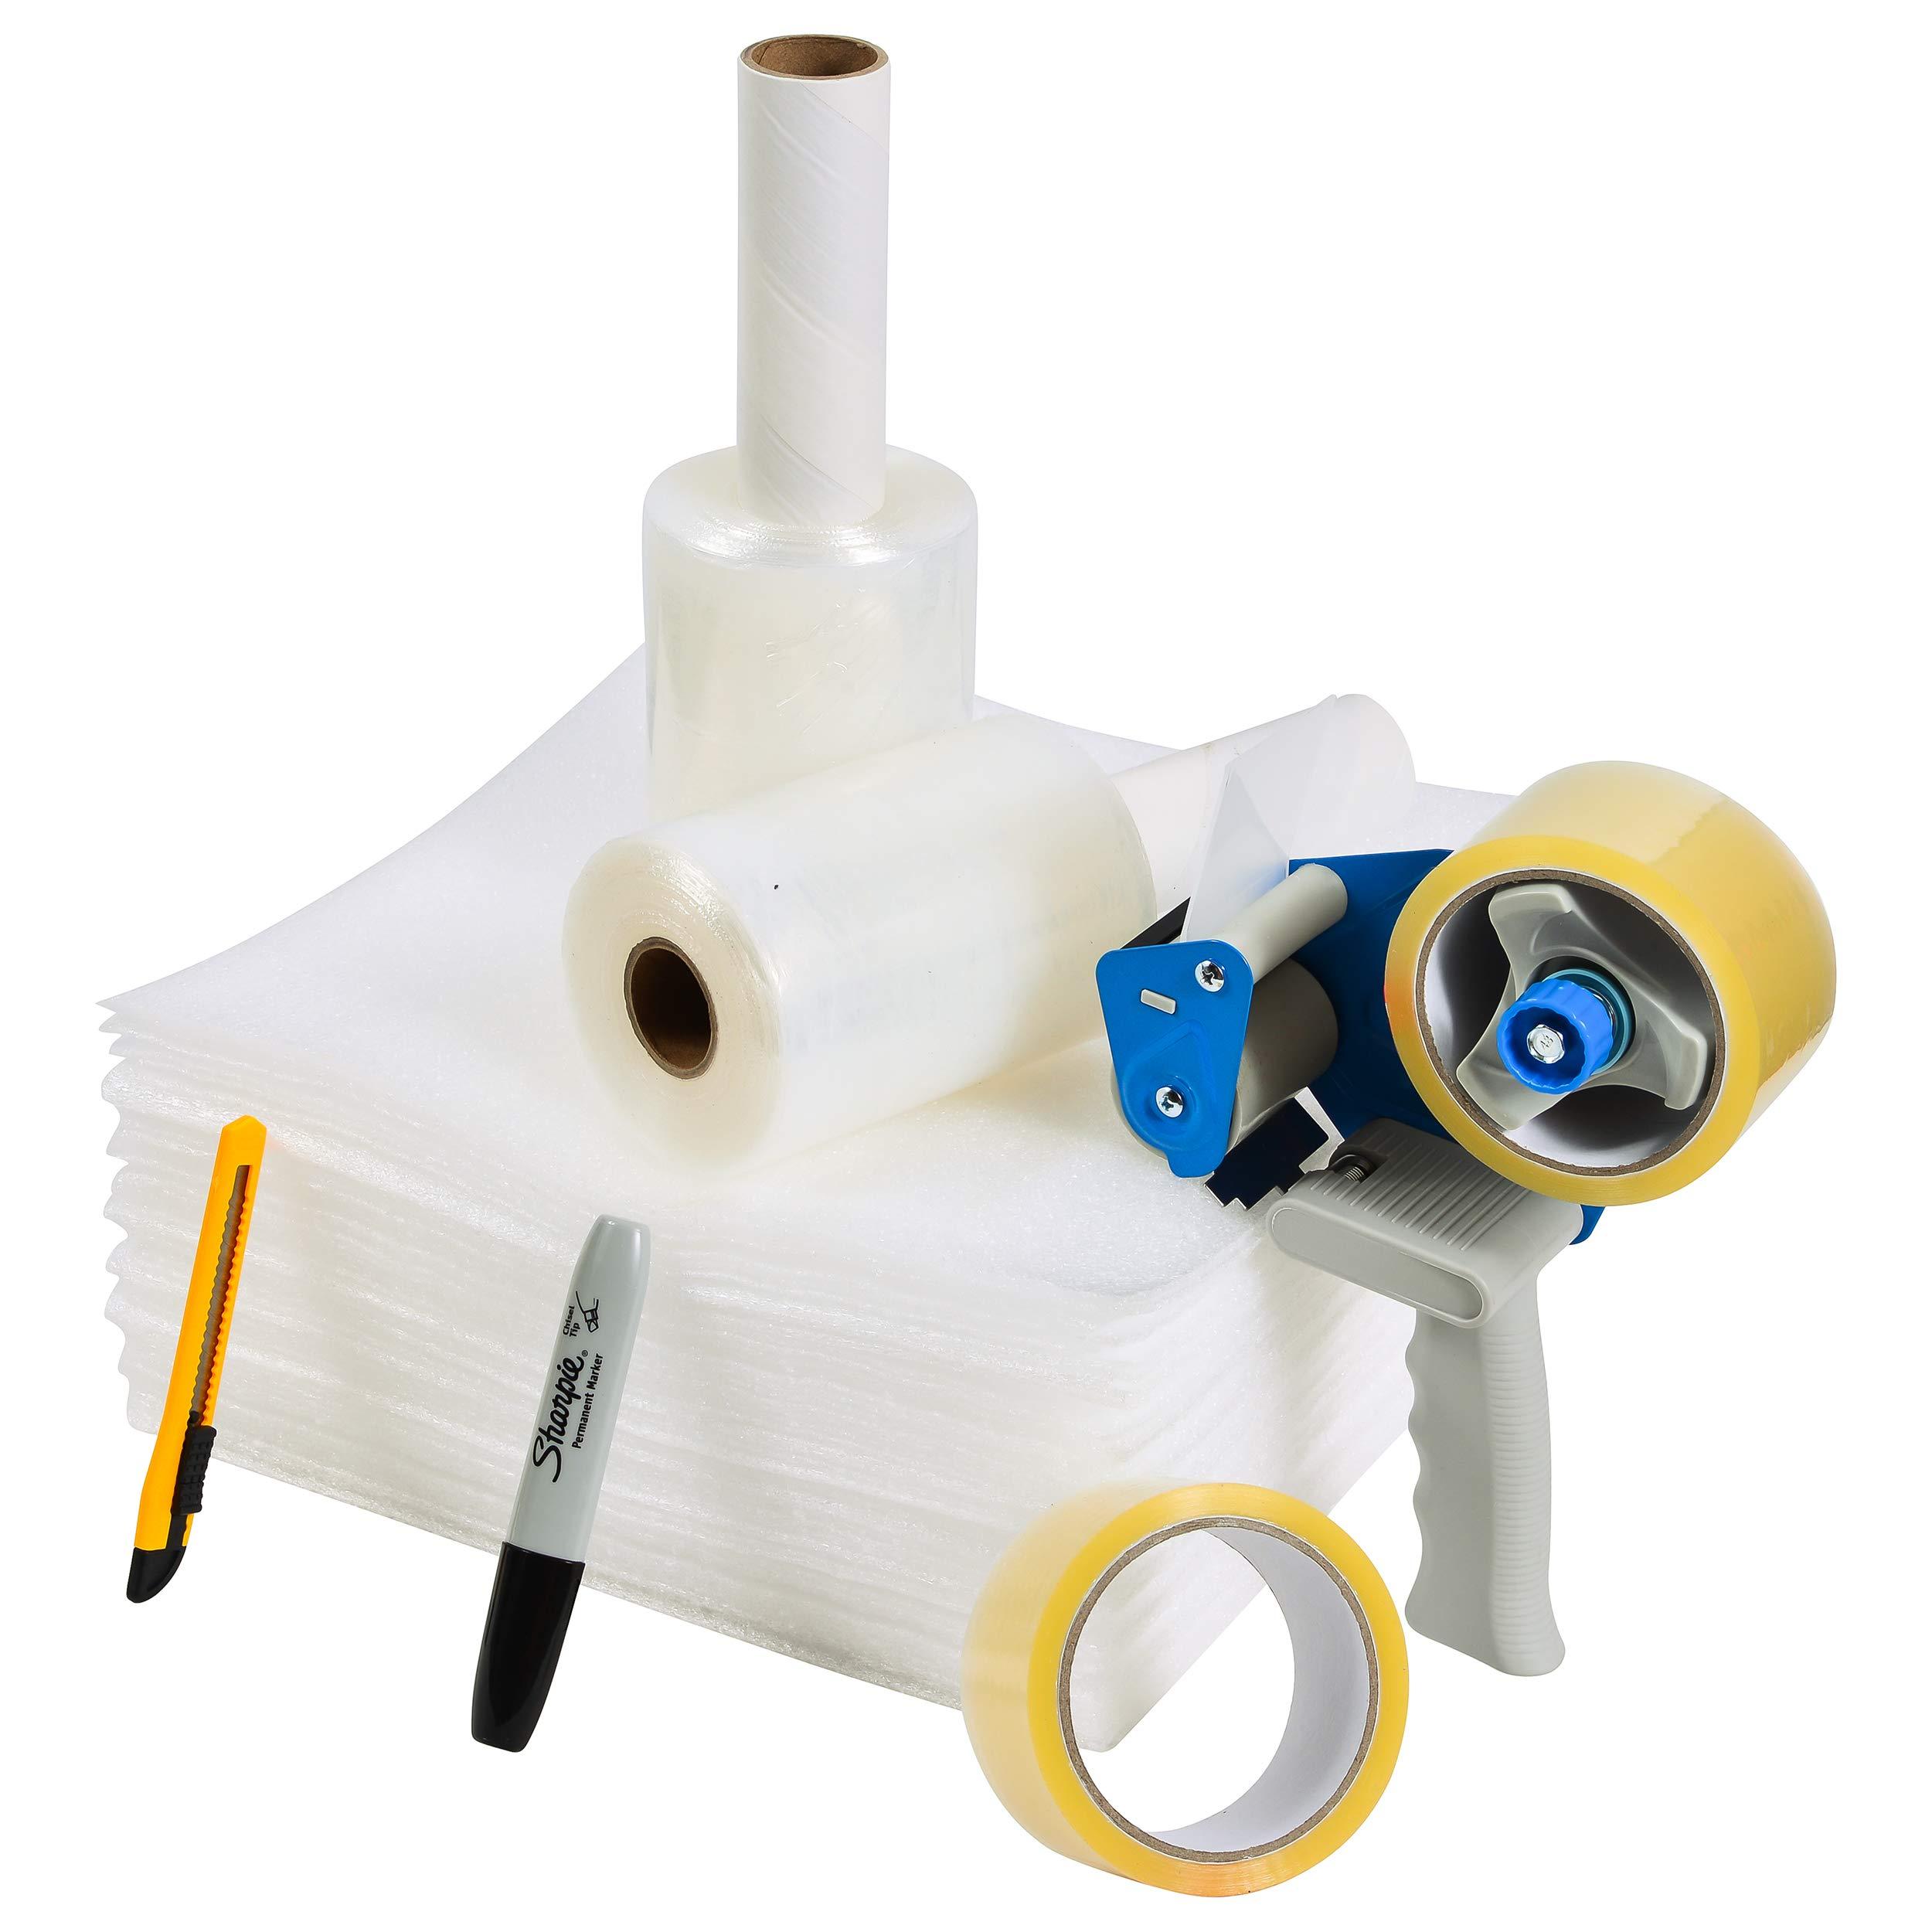 BFO Industries Moving Kit - Tape Gun, 2 Tape Rolls, 50 Foam Sheets, Film Wrap & Box Cutter